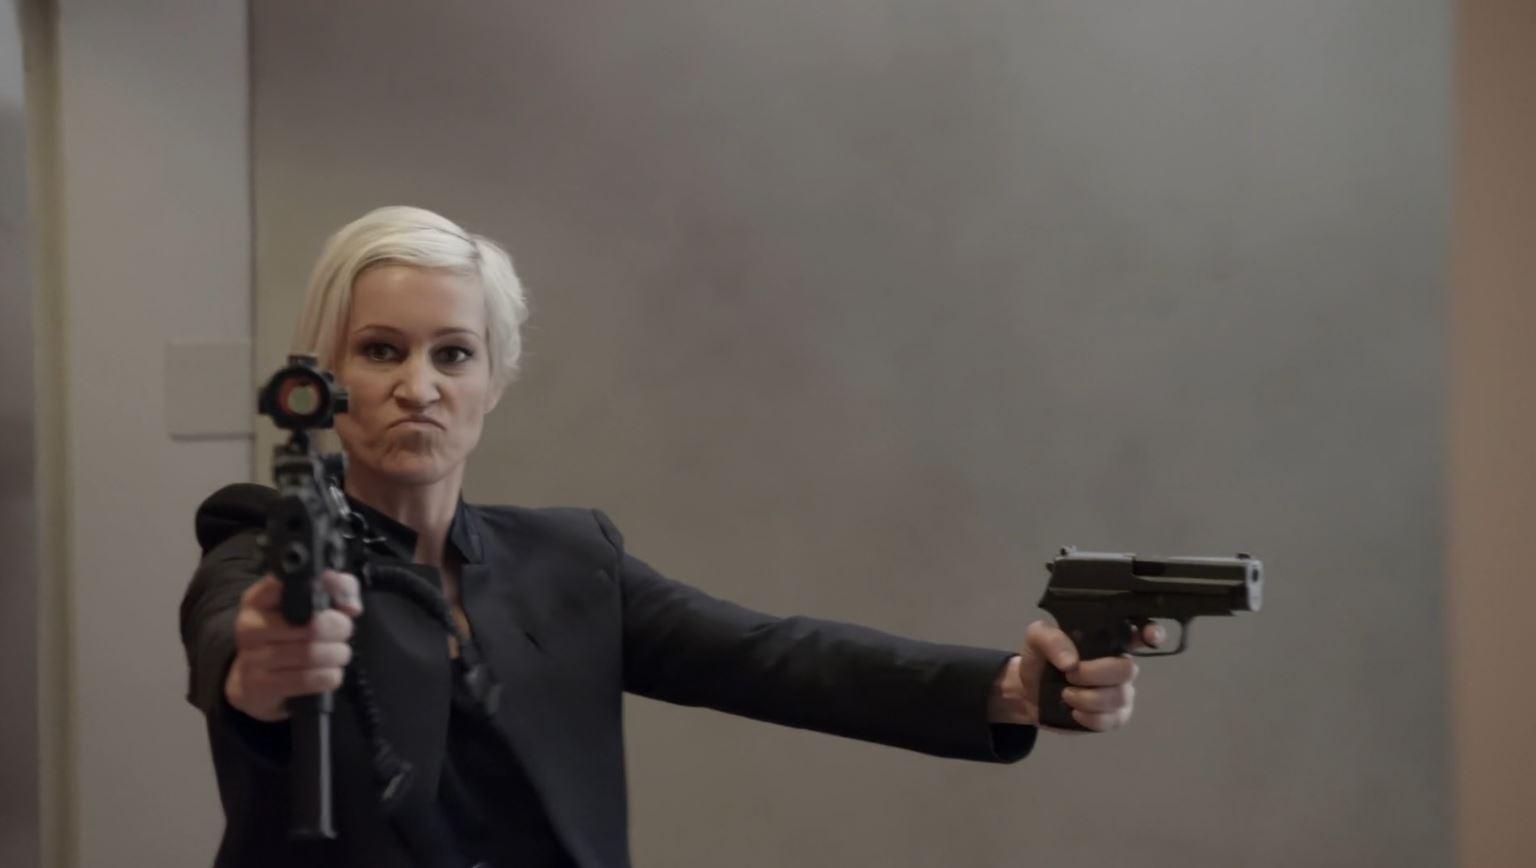 Continuum Season 3 Finale Last Minute Review - Luvia Petersen as Garza wielding two guns